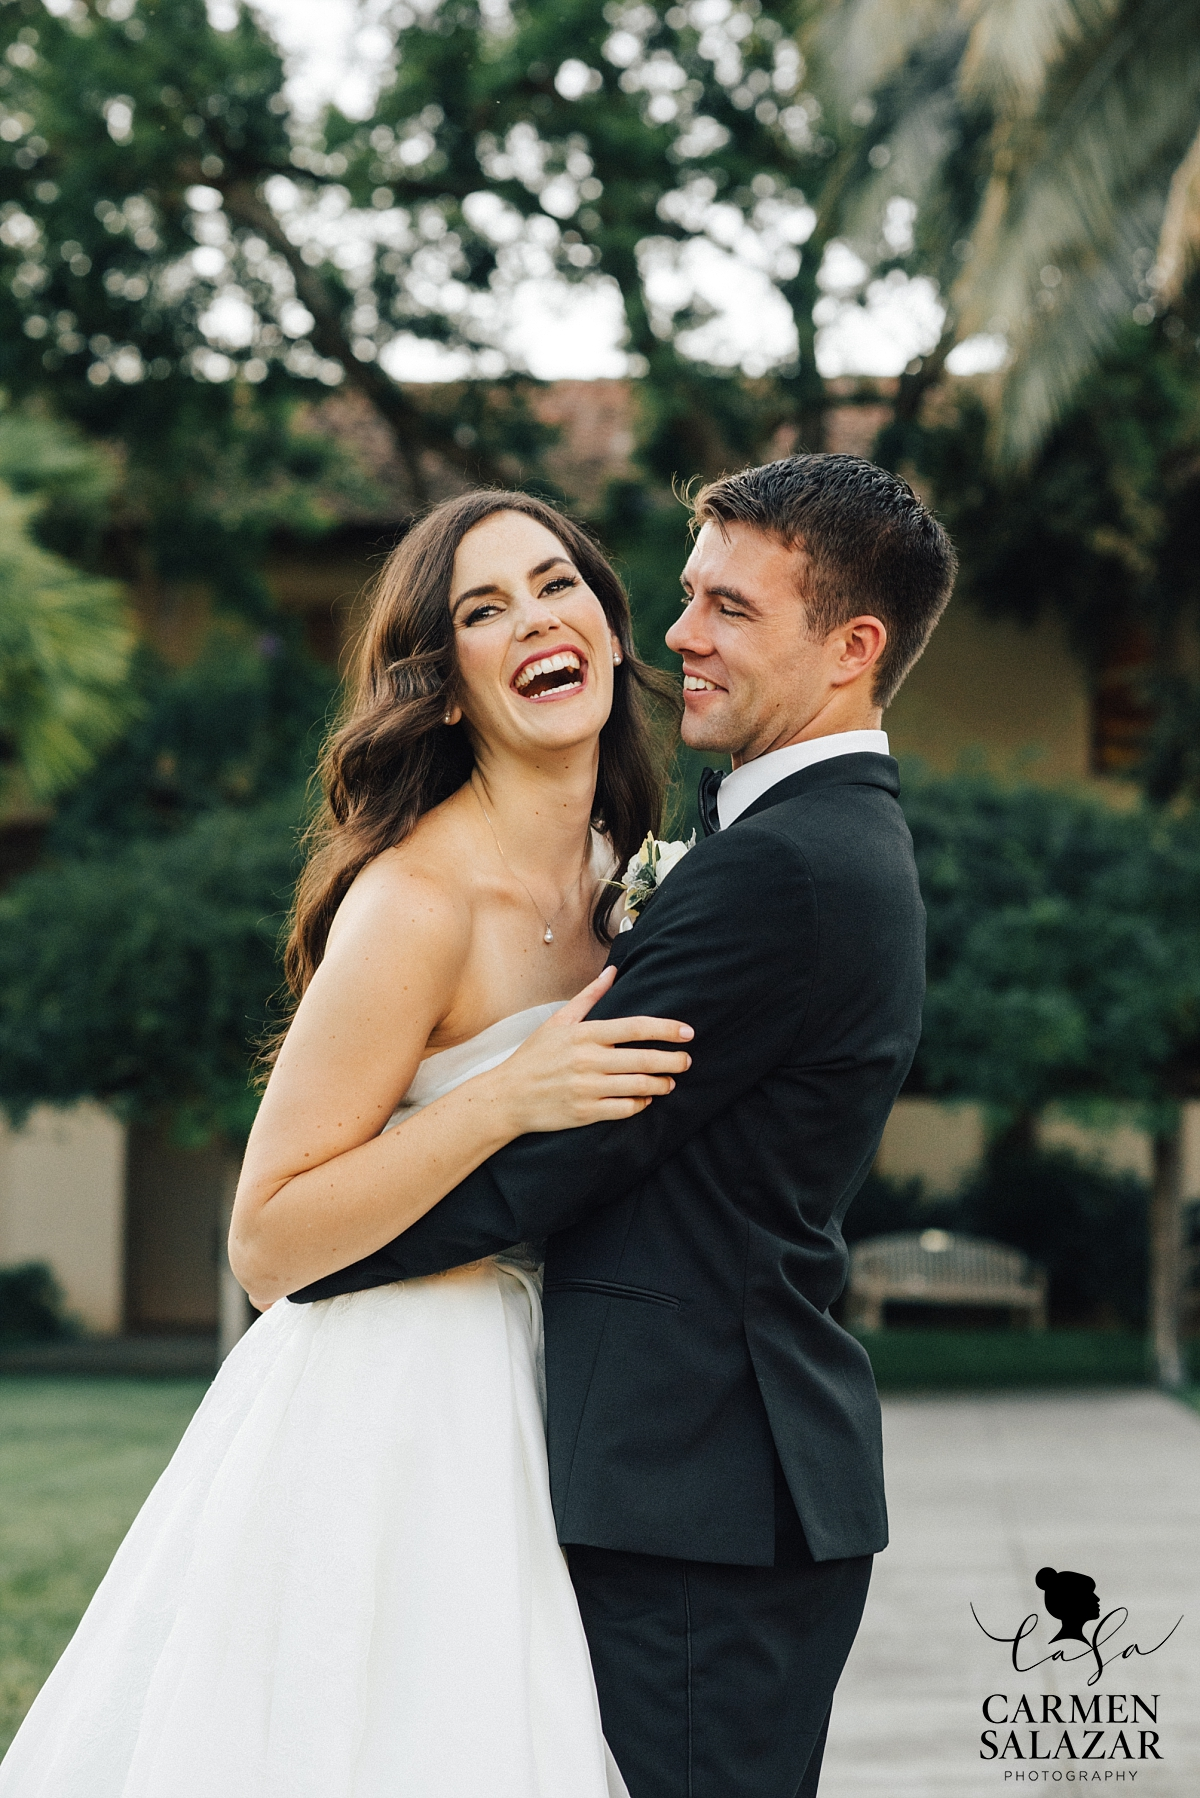 Playful outdoor Mission wedding photography - Carmen Salazar